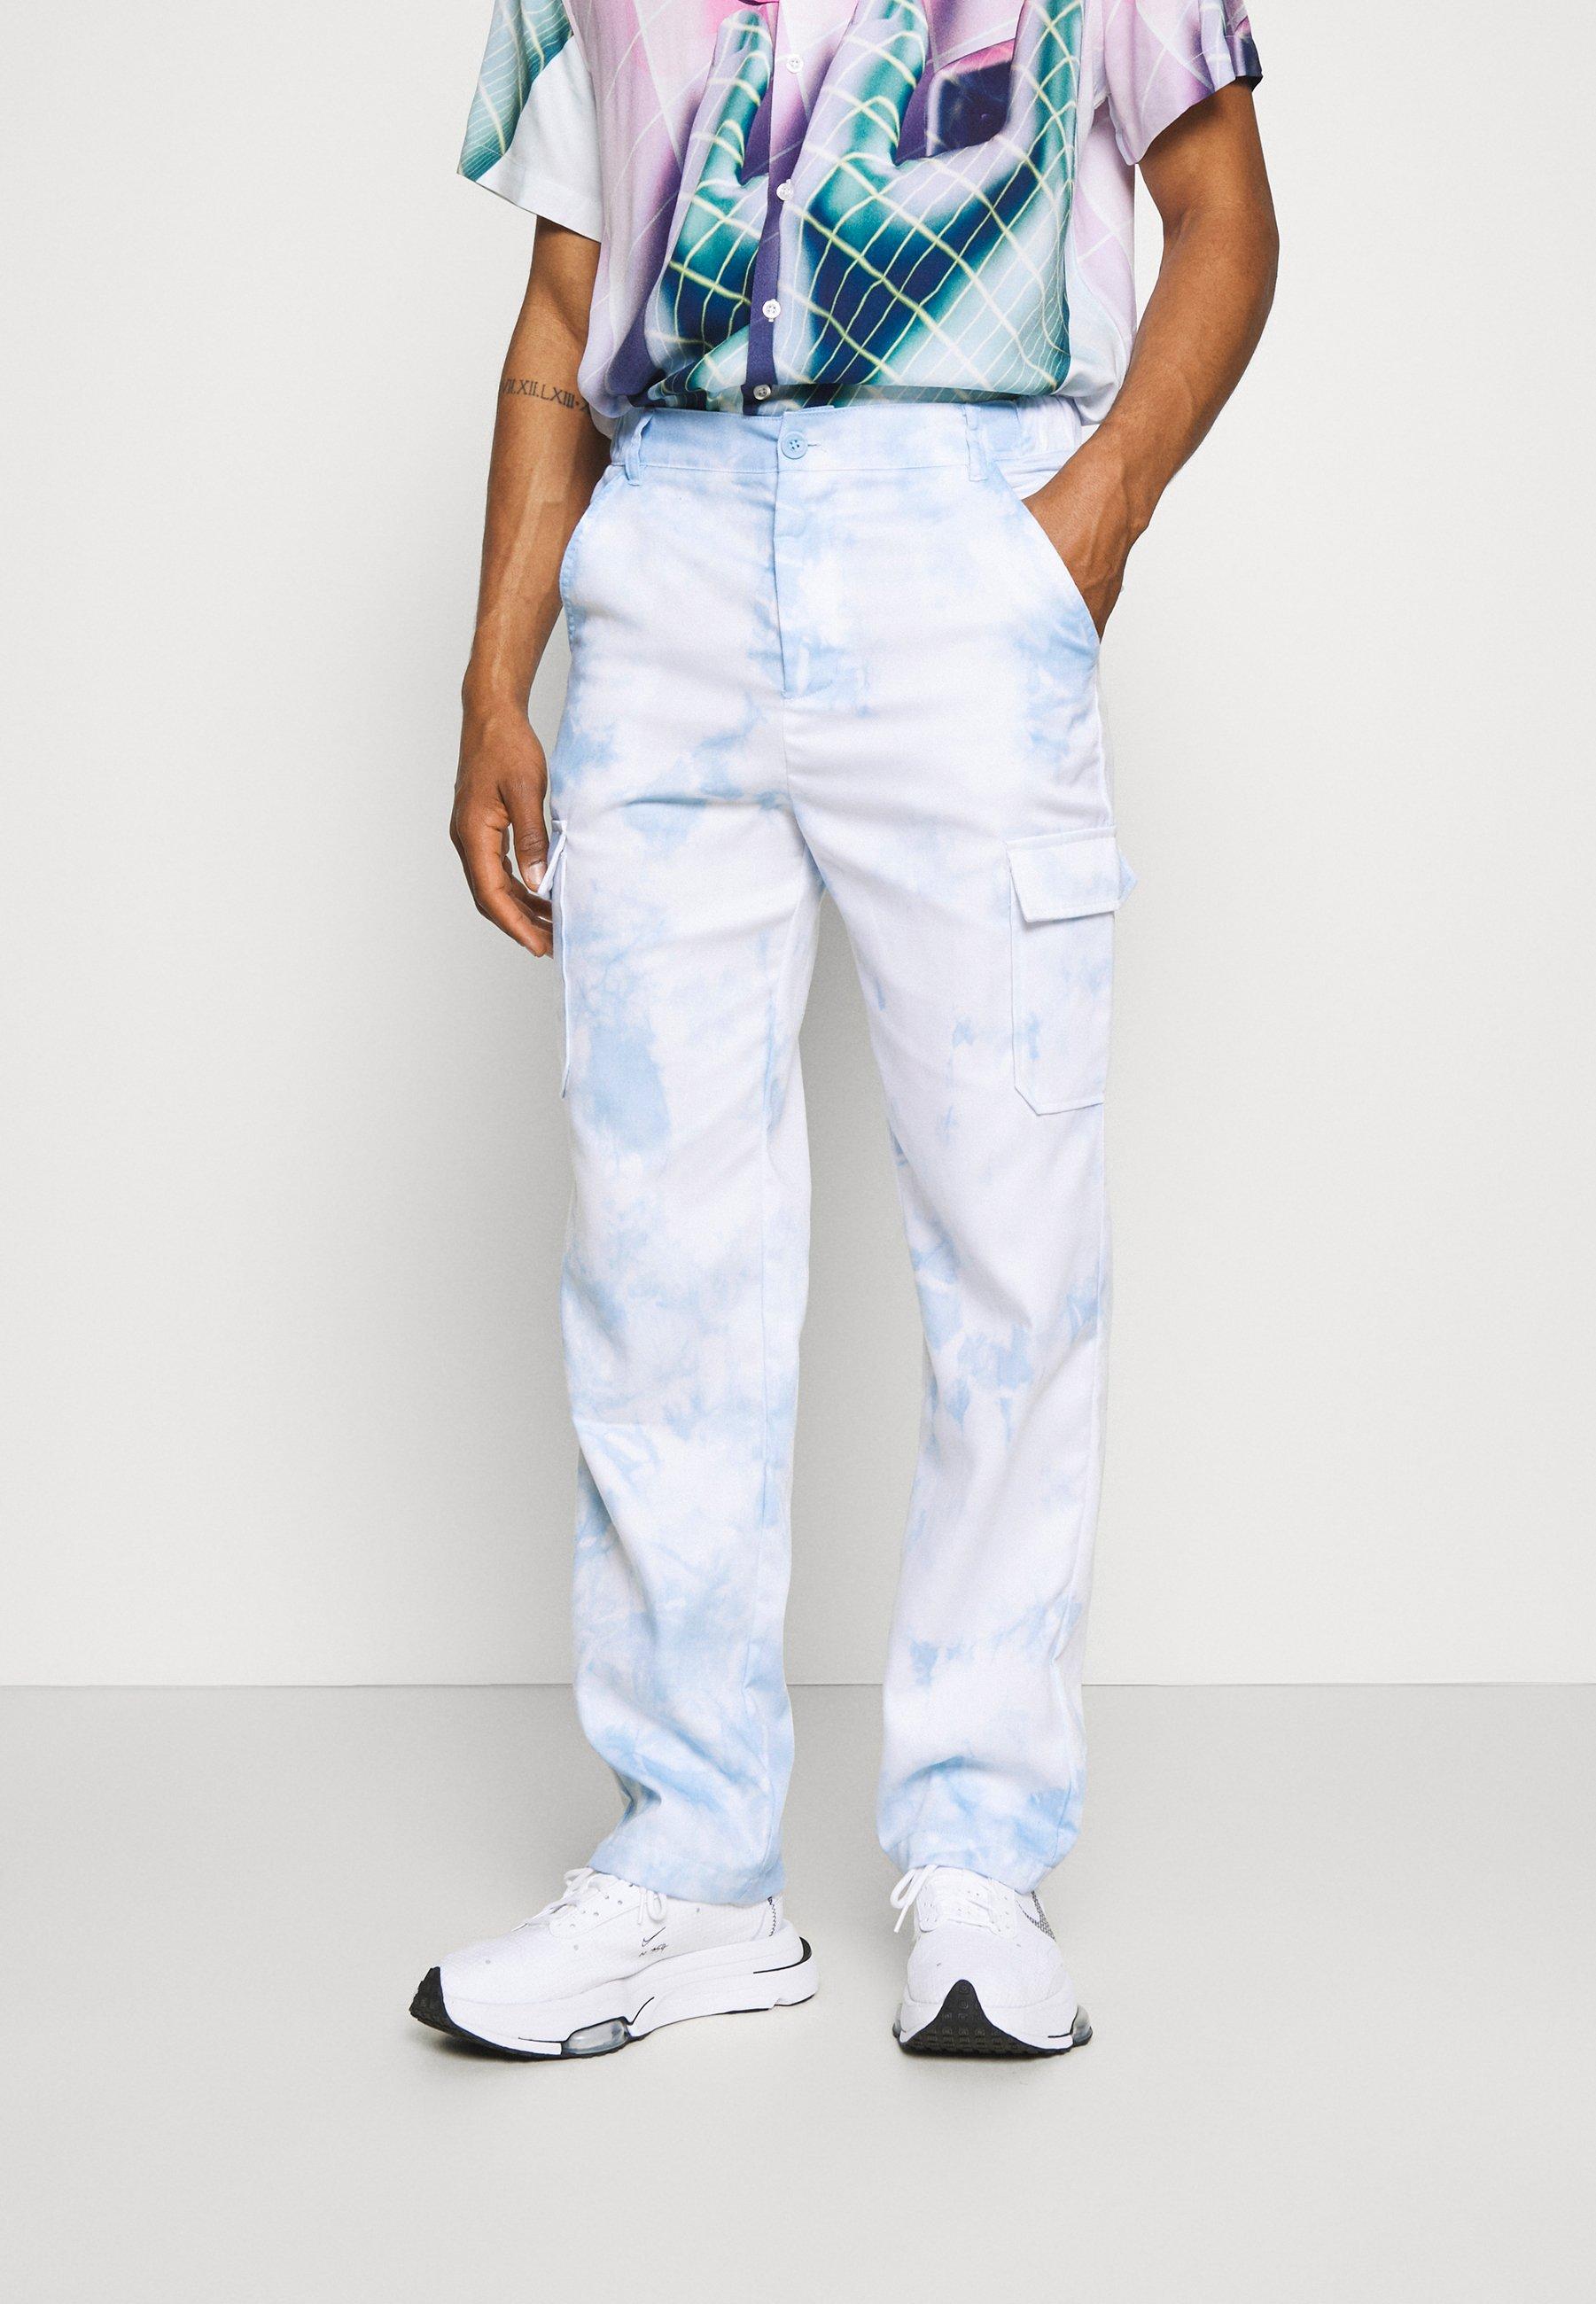 Homme PANT IN TIE DYE UNISEX - Pantalon cargo